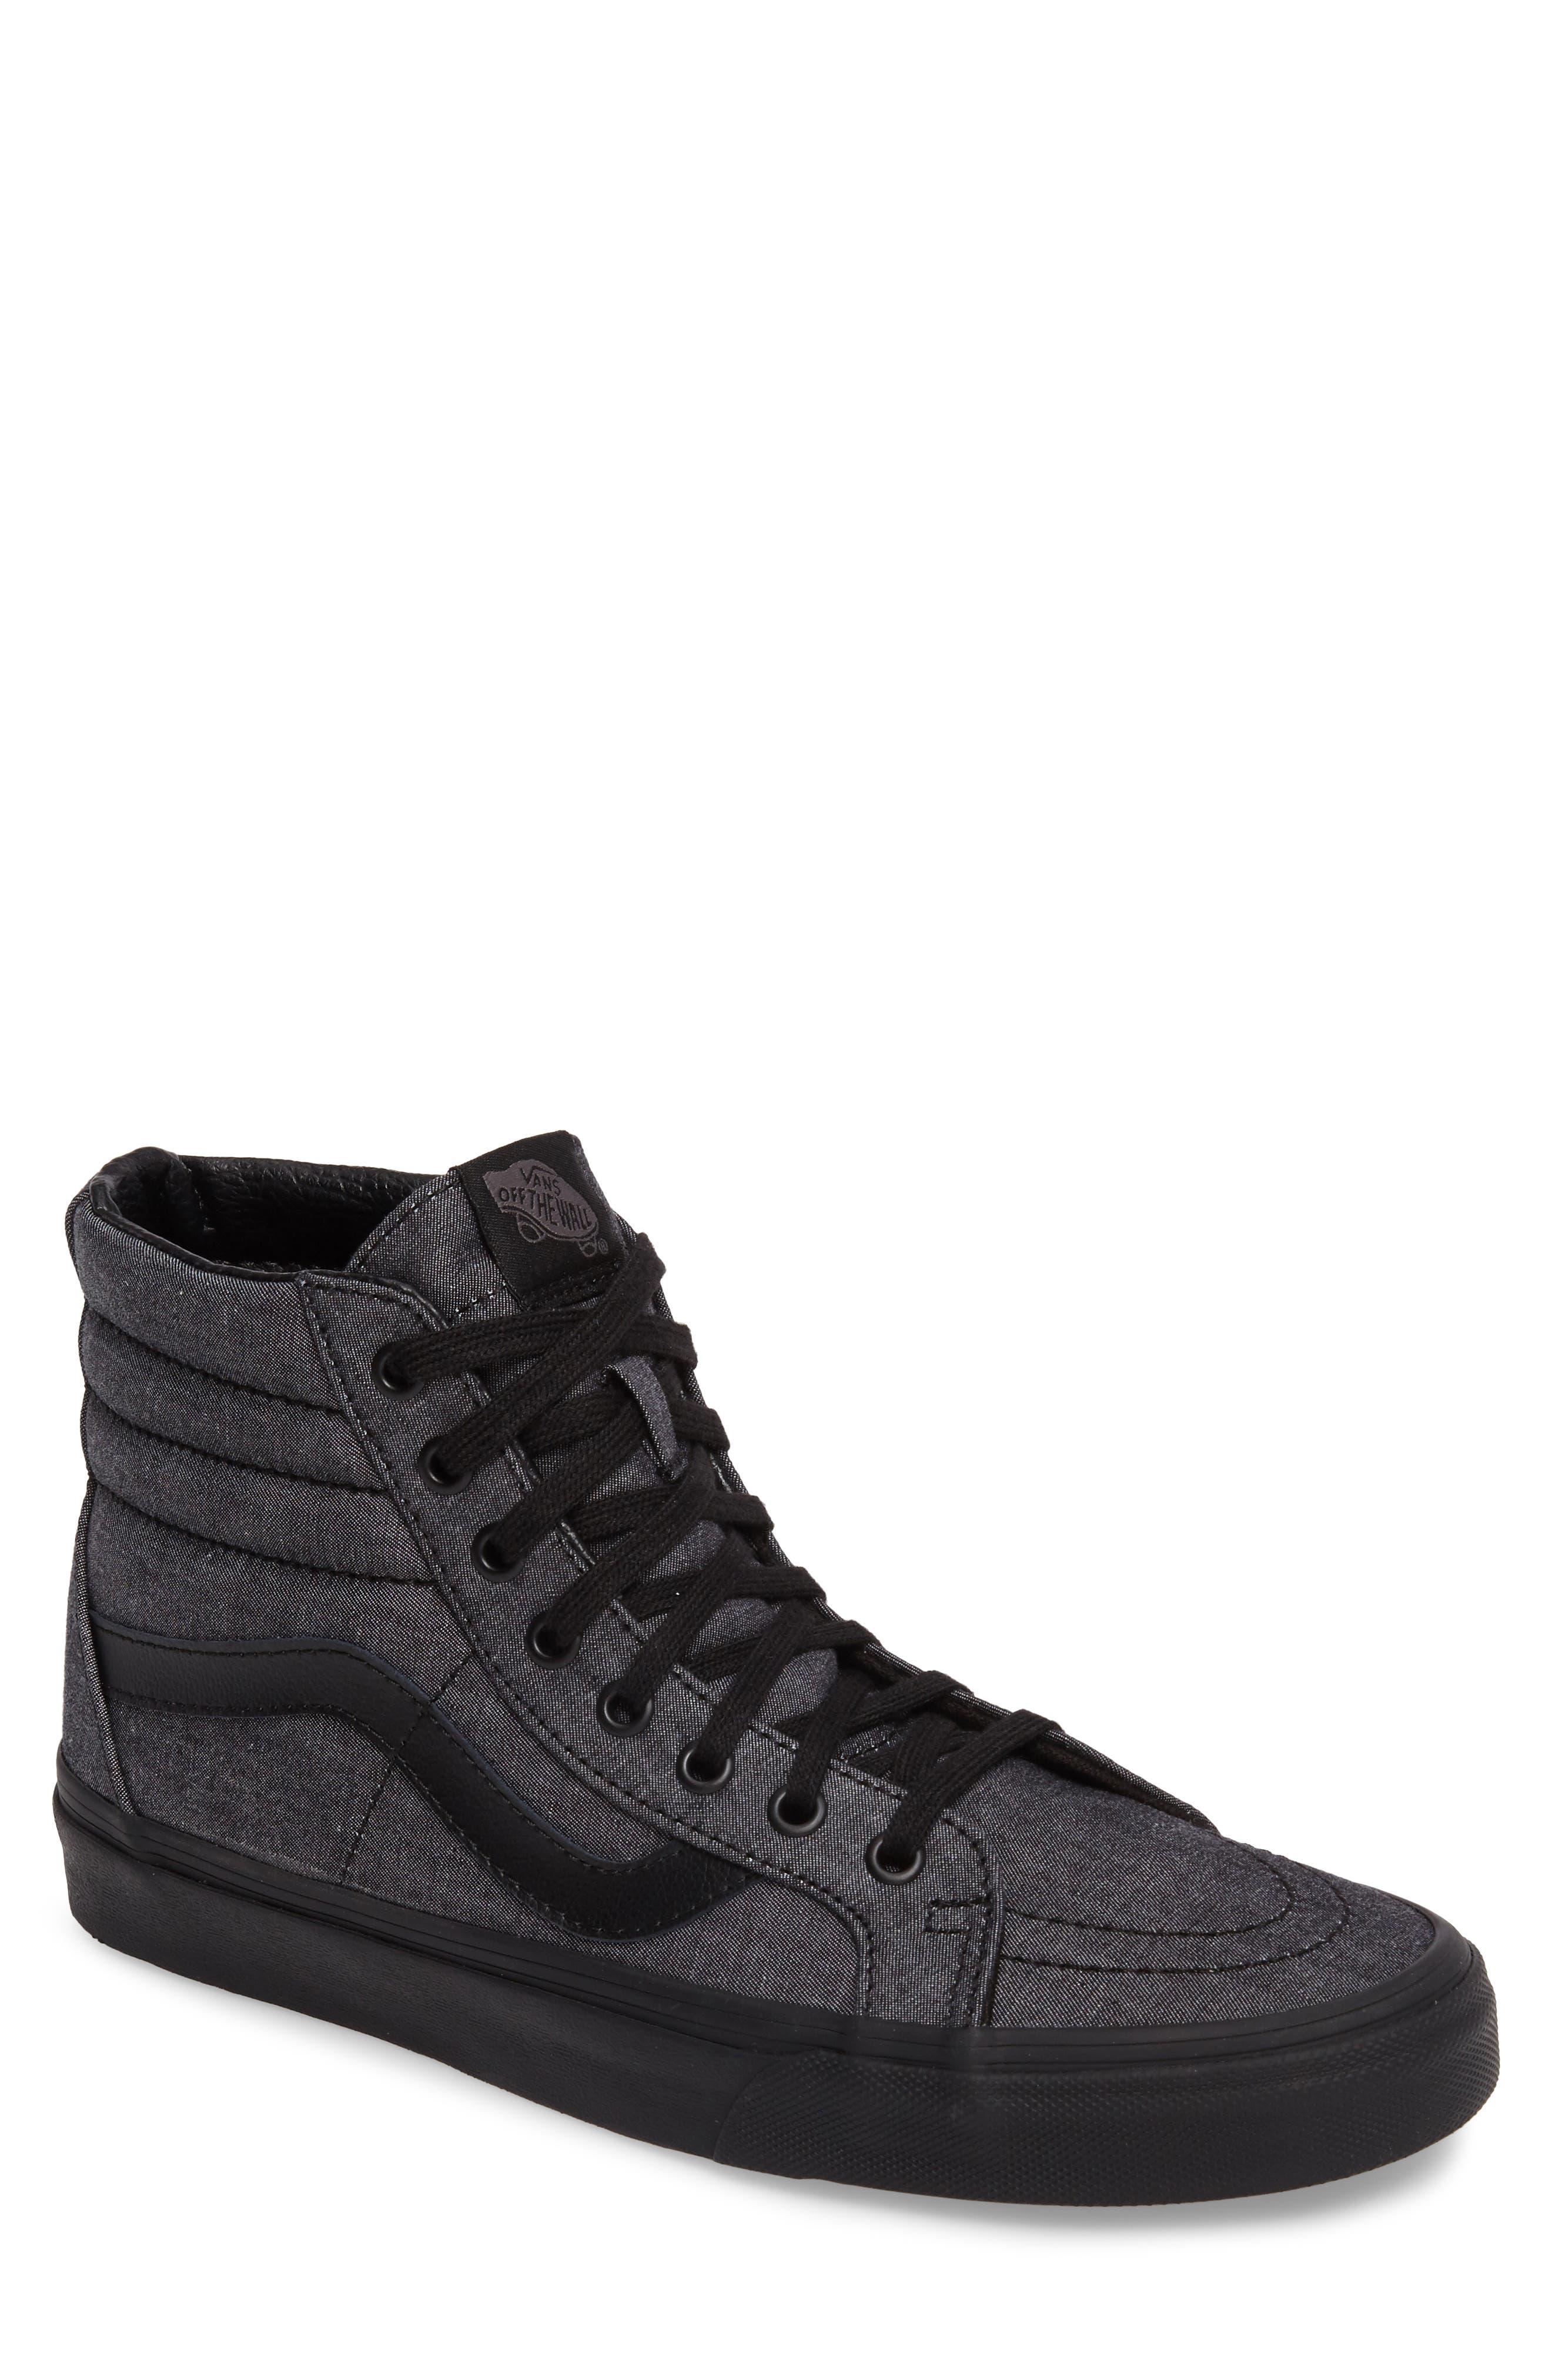 Main Image - Vans 'Sk8-HiReissue' Sneaker (Men)